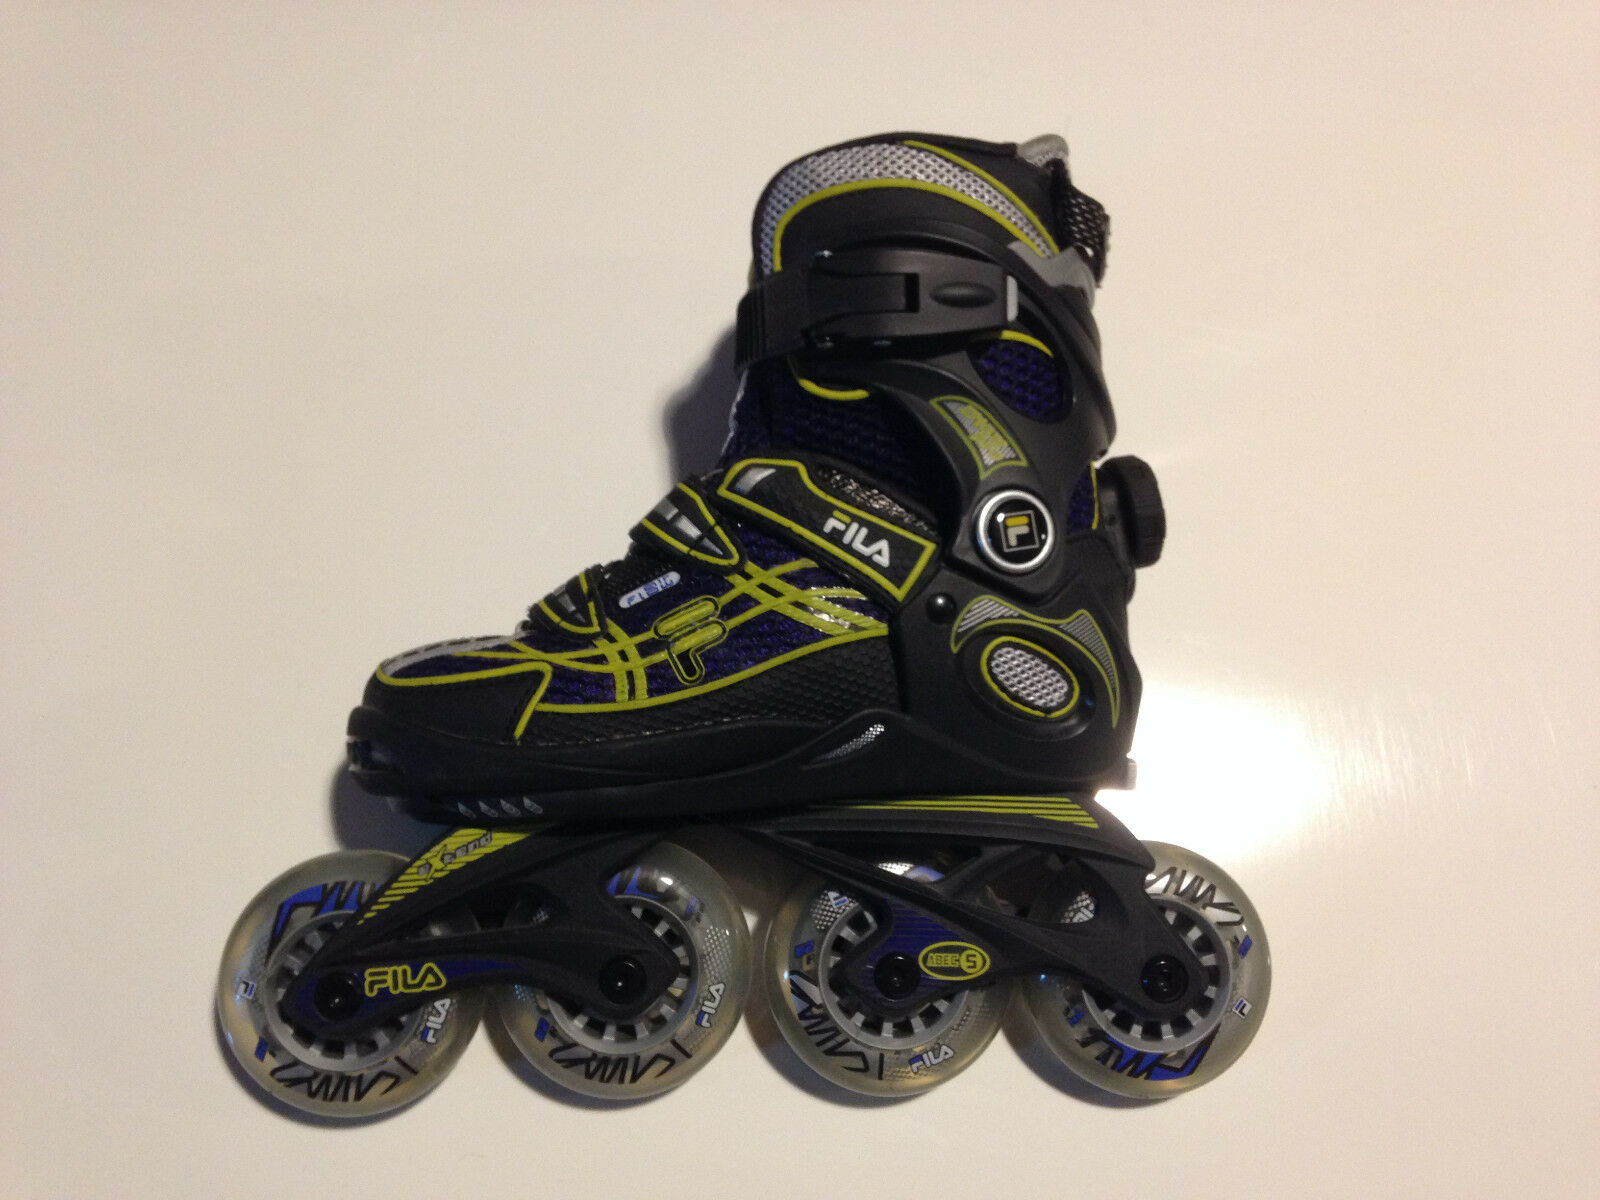 Fila Wizy Pro Boys Jungen Fitness Inline Skates Gr. M (32-35) verstellbar  | Schöne Farbe